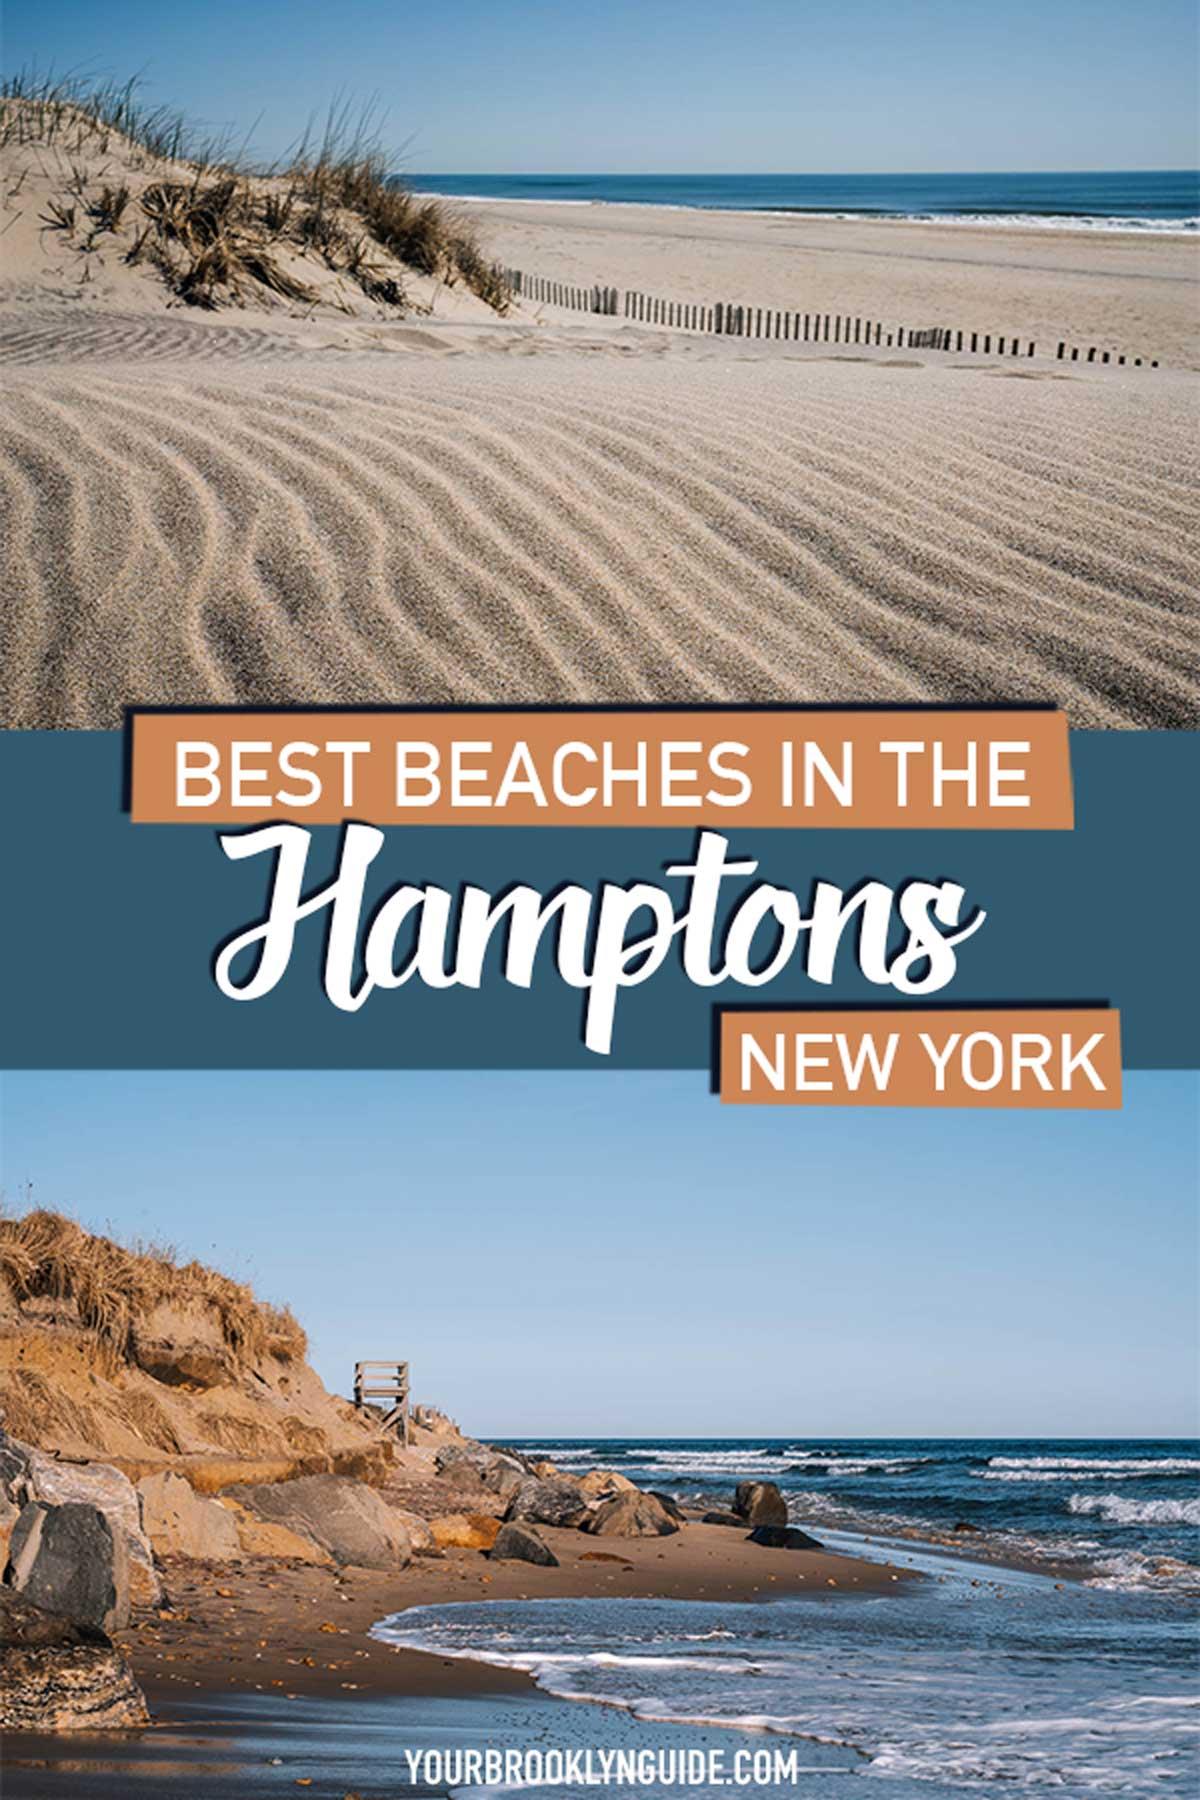 best-beaches-in-the-hamptons